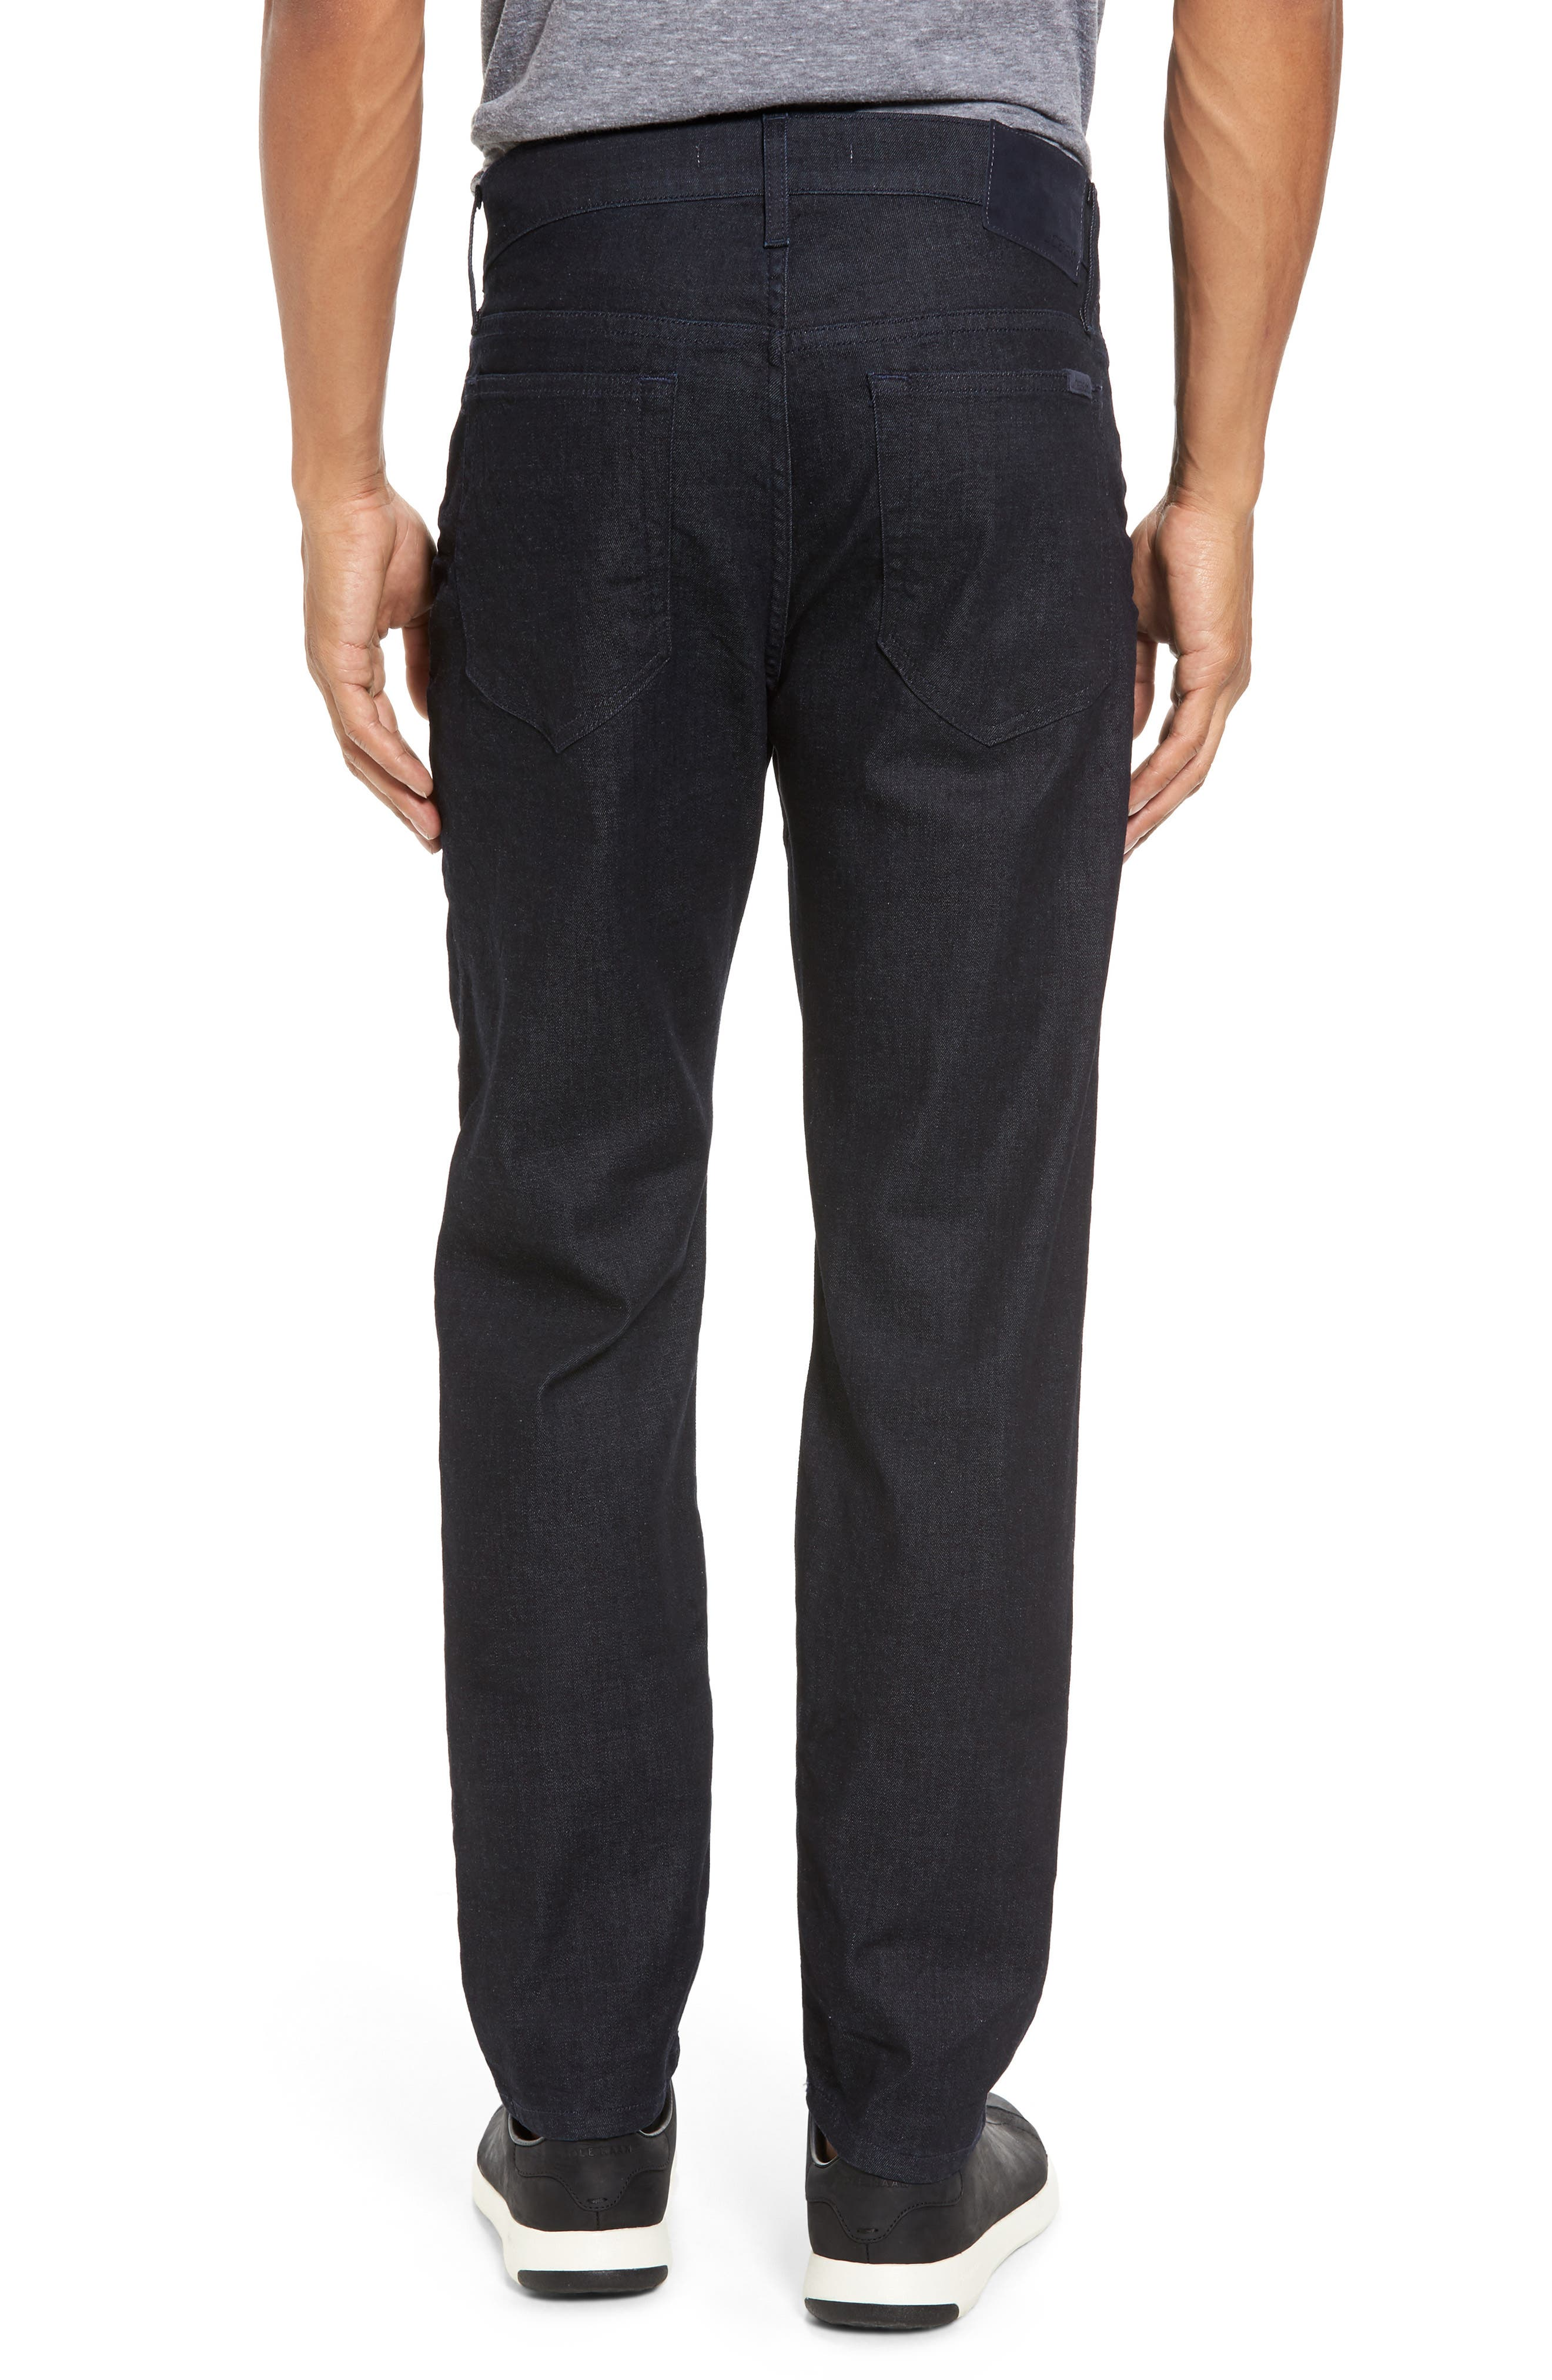 Brixton Slim Straight Fit Jeans,                             Alternate thumbnail 2, color,